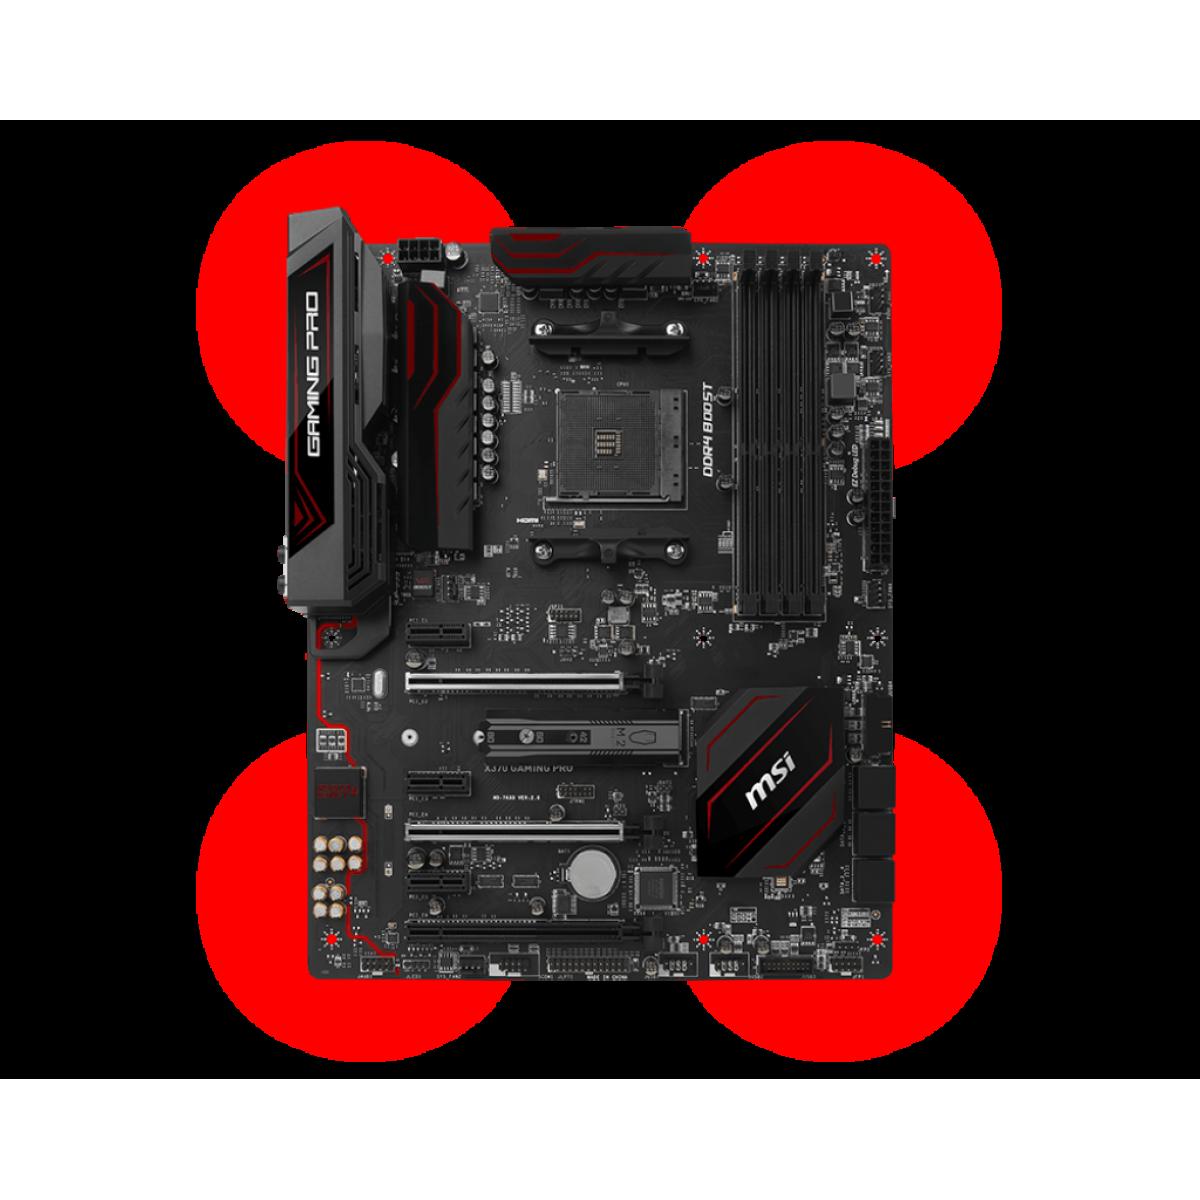 Placa Mãe MSI X370 GAMING PRO, Chipset X370, AMD AM4, ATX, DDR4